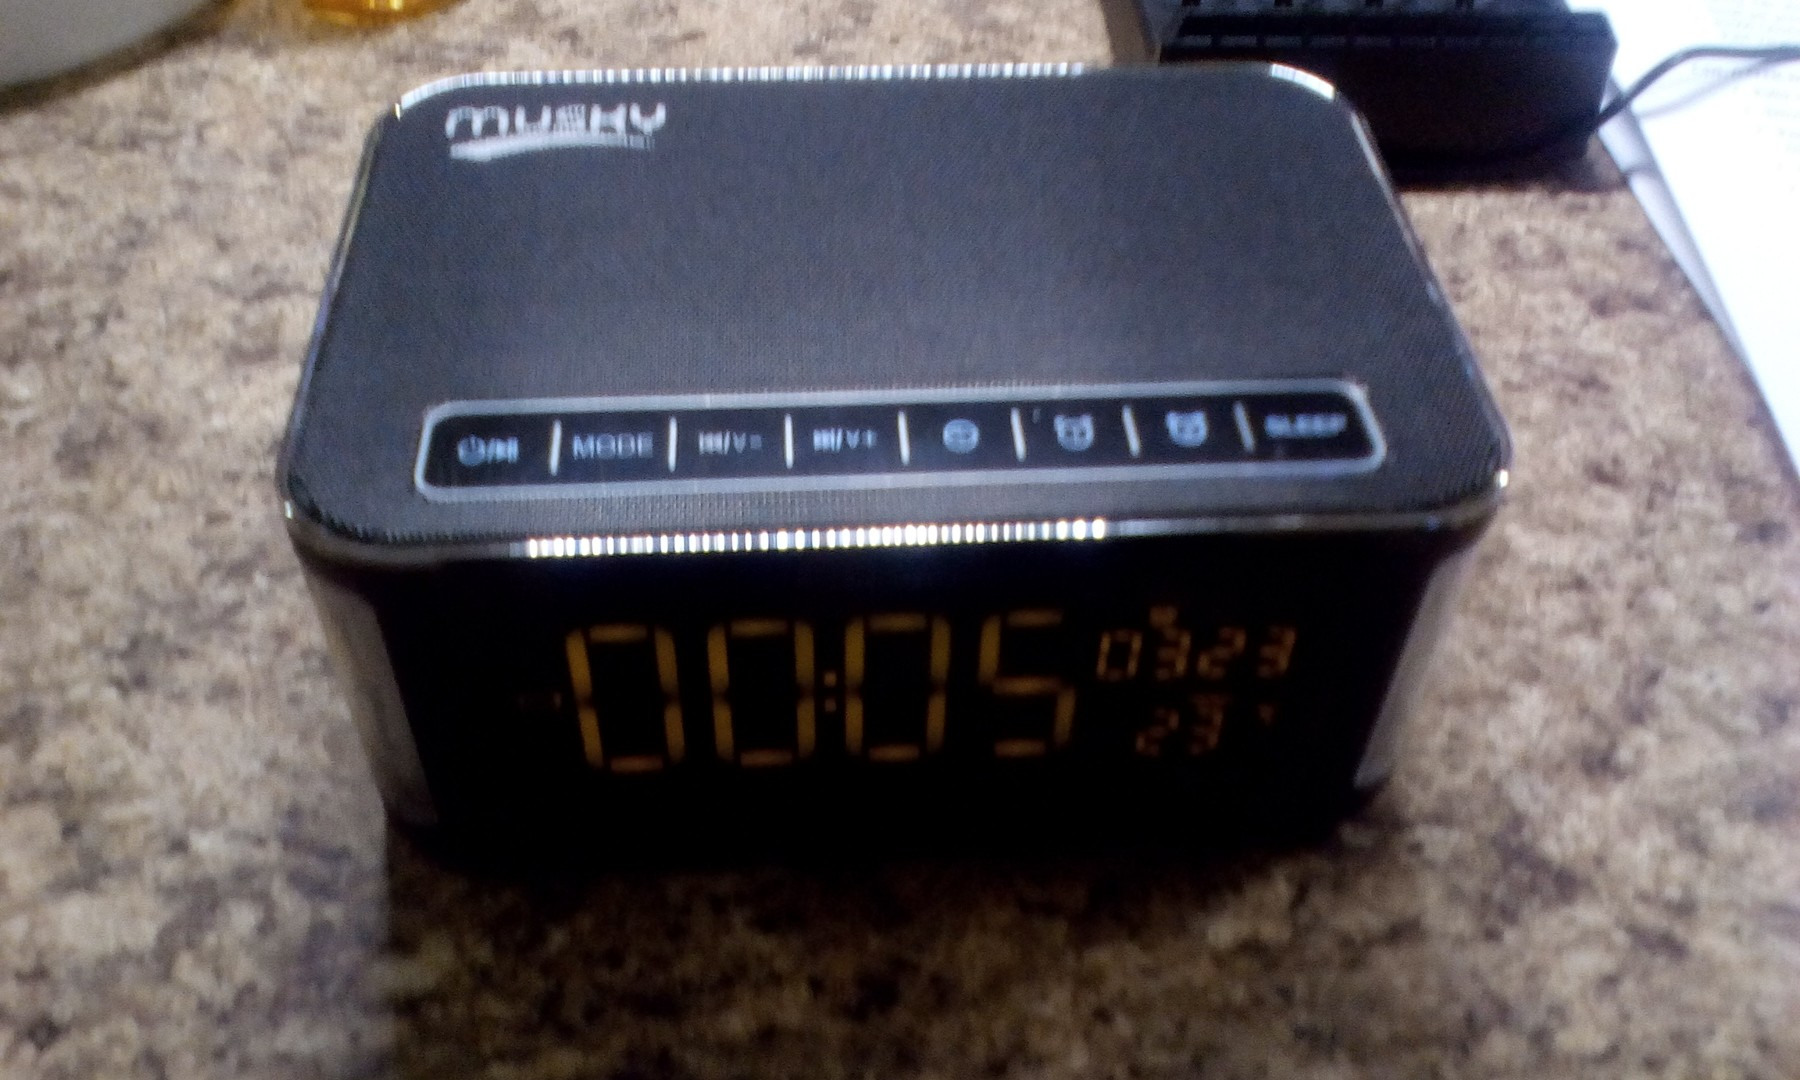 Nice speaker with clock function